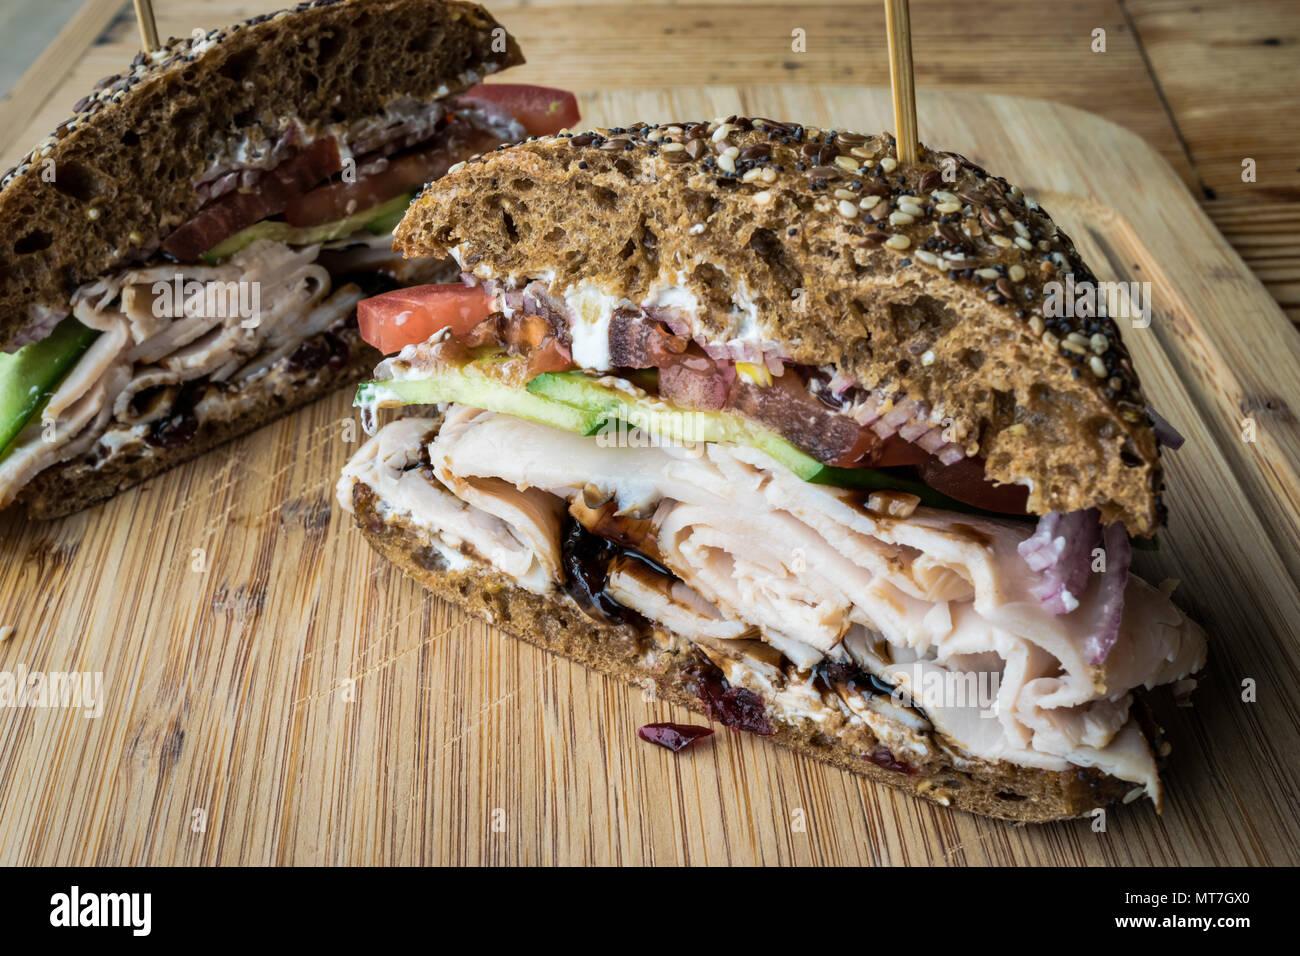 Sliced Turkey Sandwich On Wooden Platter Stock Photo Alamy